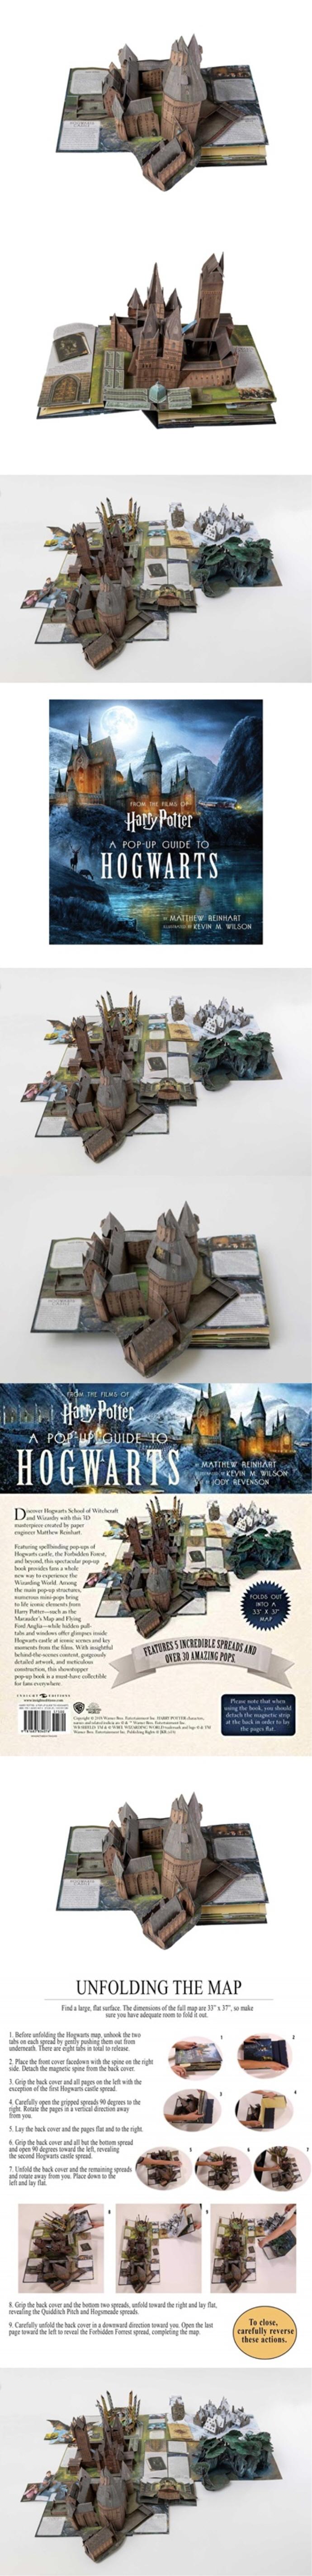 Harry Potter: A Pop-Up Guide to Hogwarts 도서 상세이미지